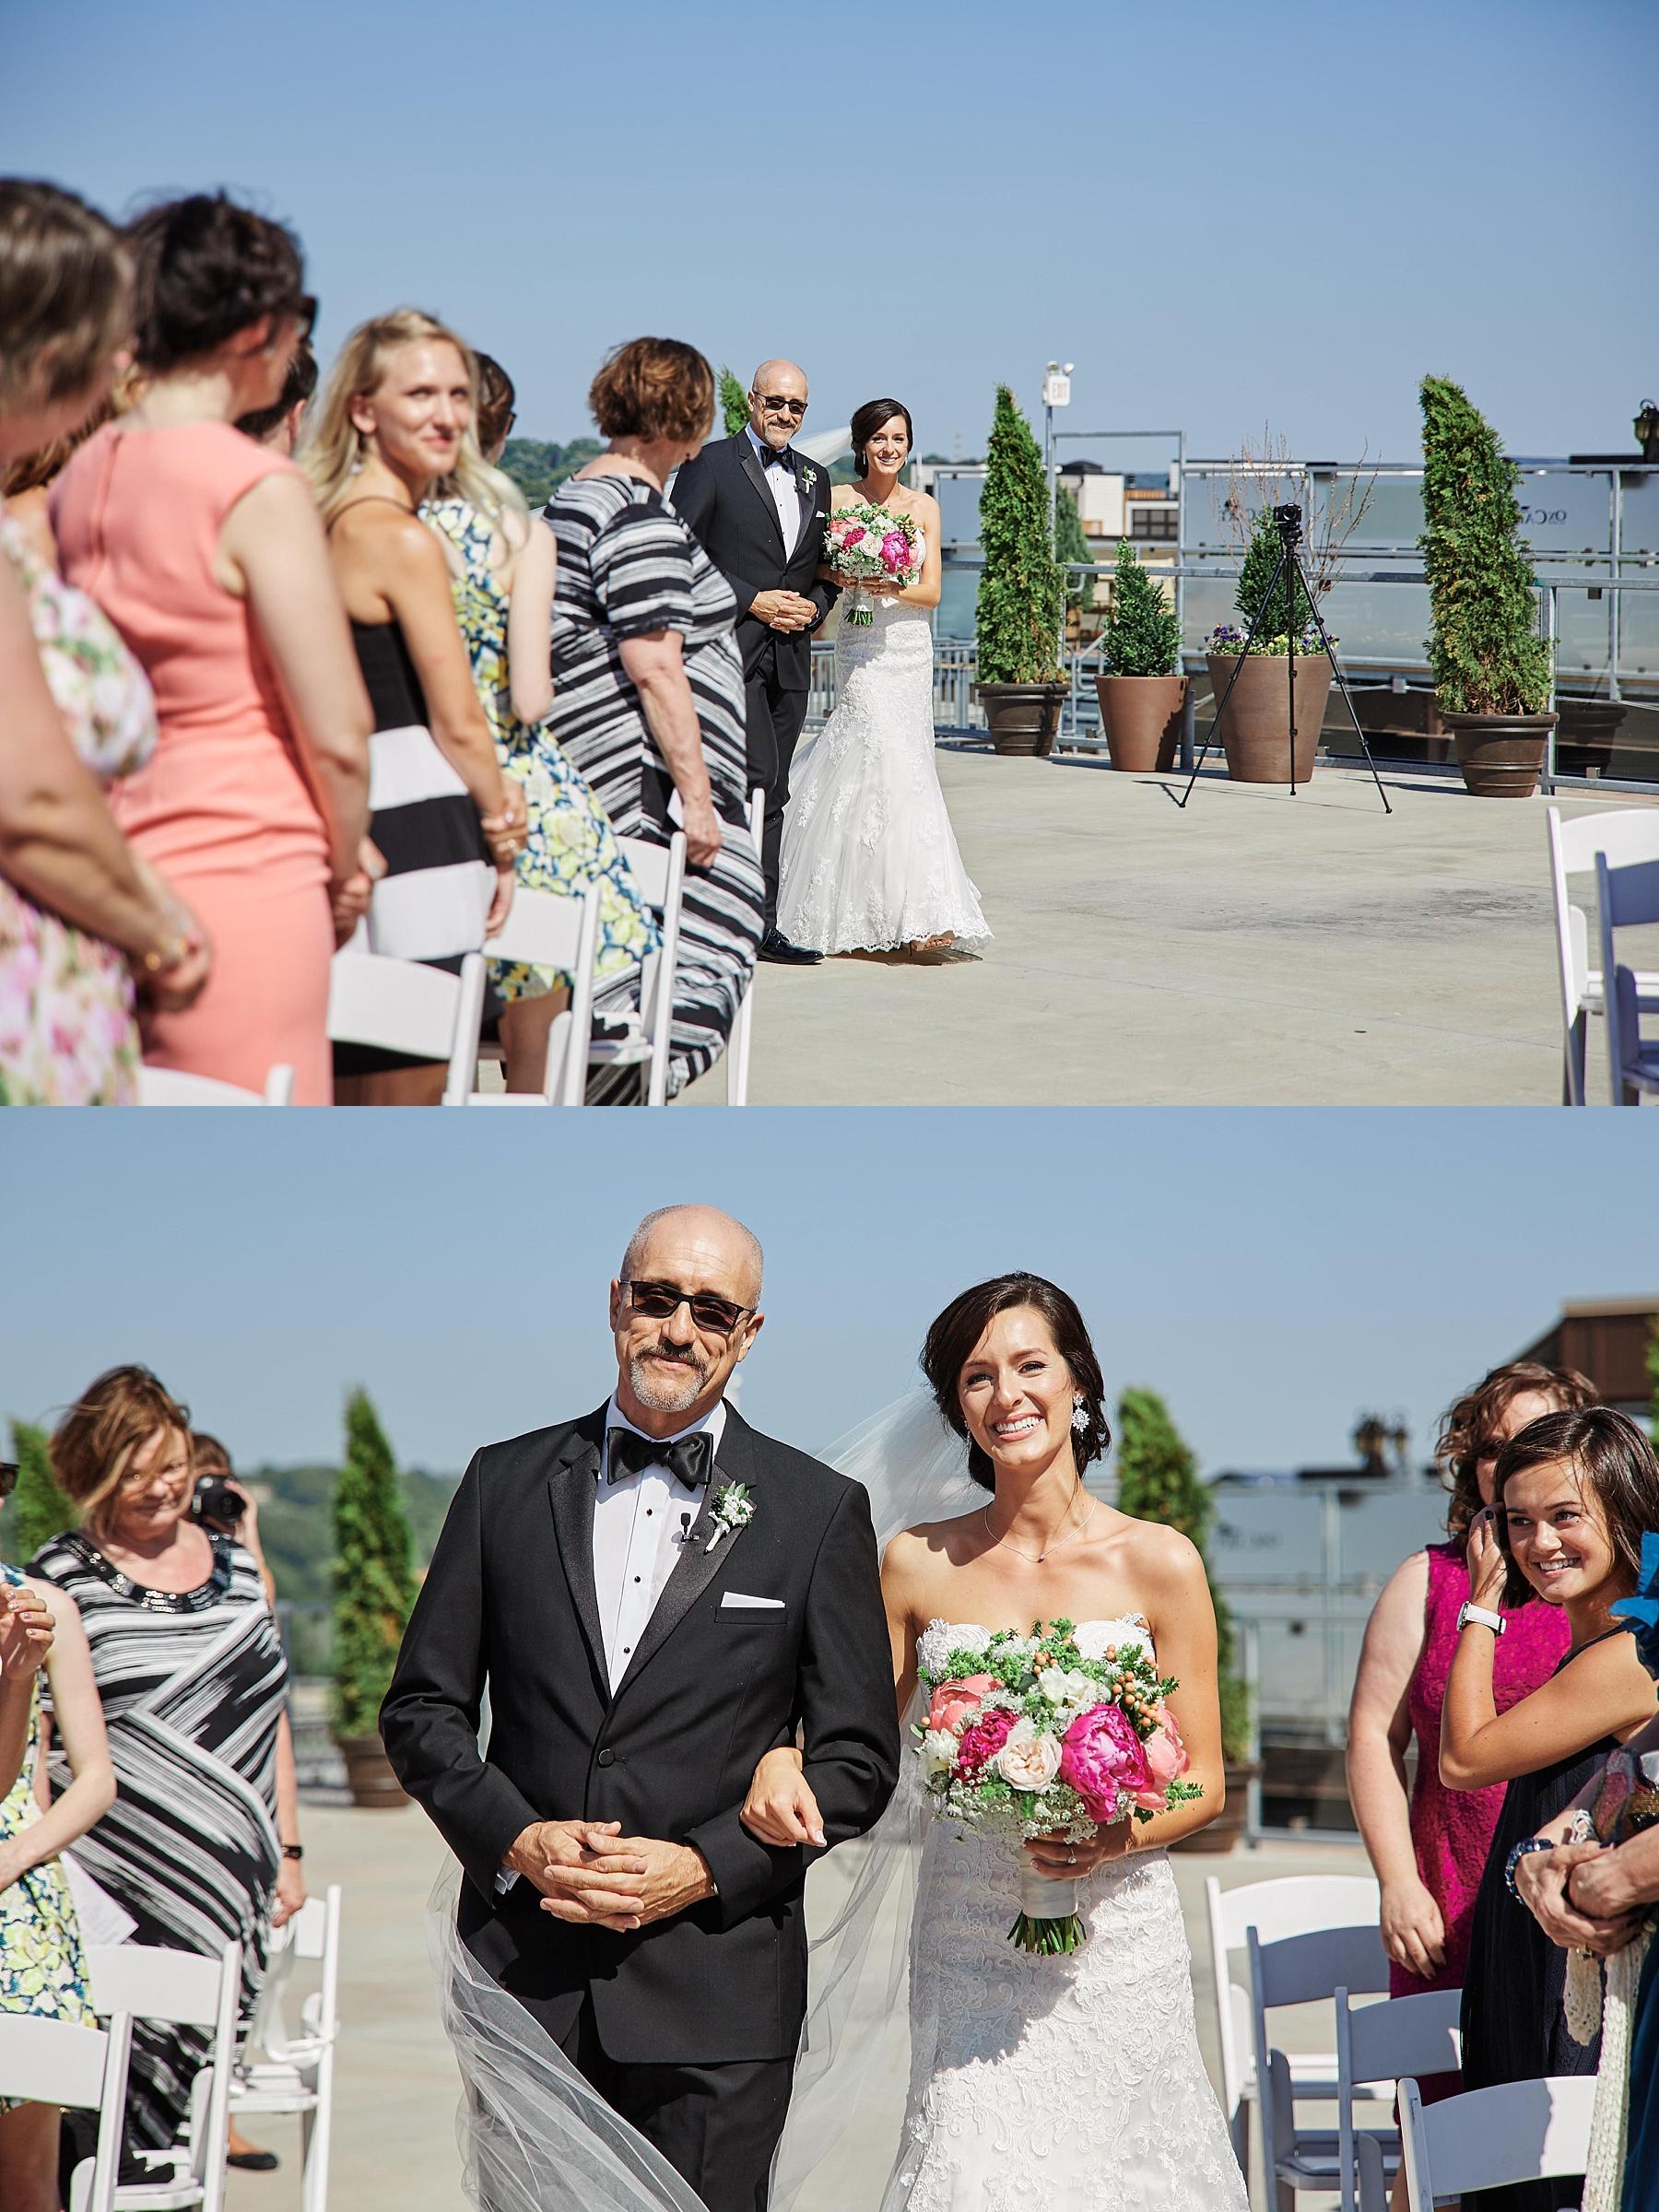 ABULAE-Wedding-Saint-paul-MN-Josh-Sofia-Wedding-Mears-Park_0751.jpg